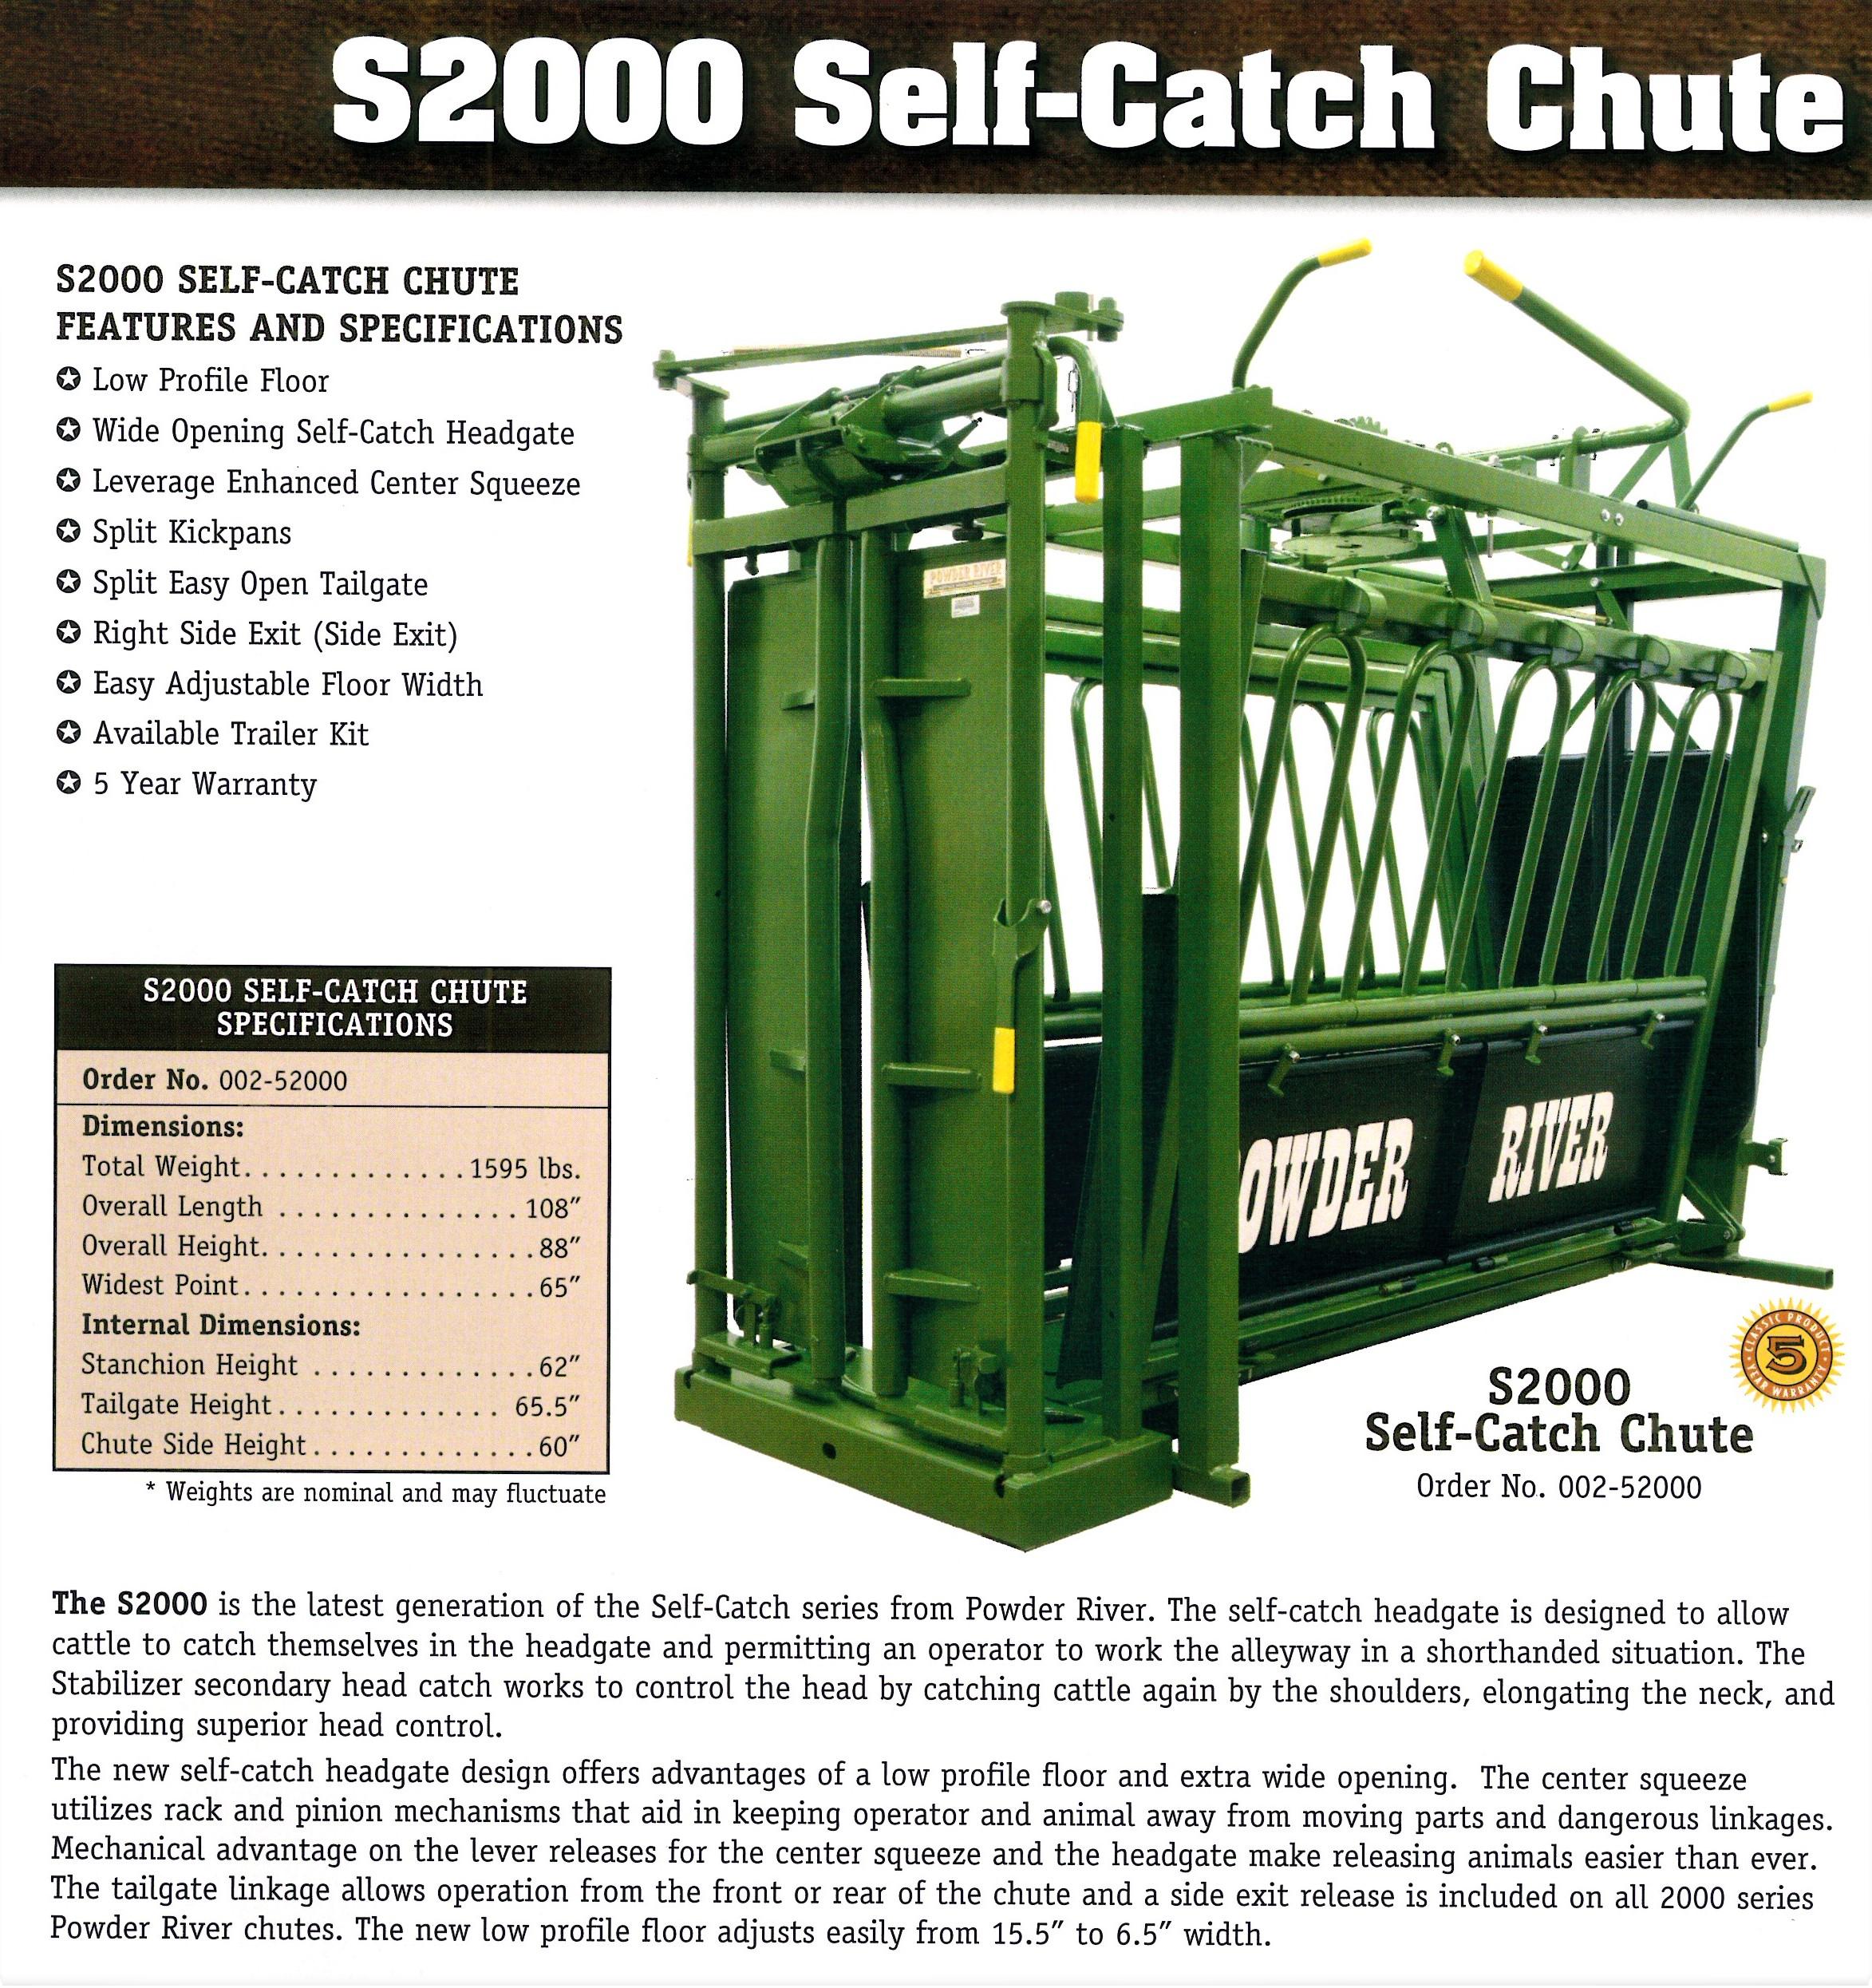 august-2020-powder-river-s2000-self-catch-chute-order-002-52000.jpg